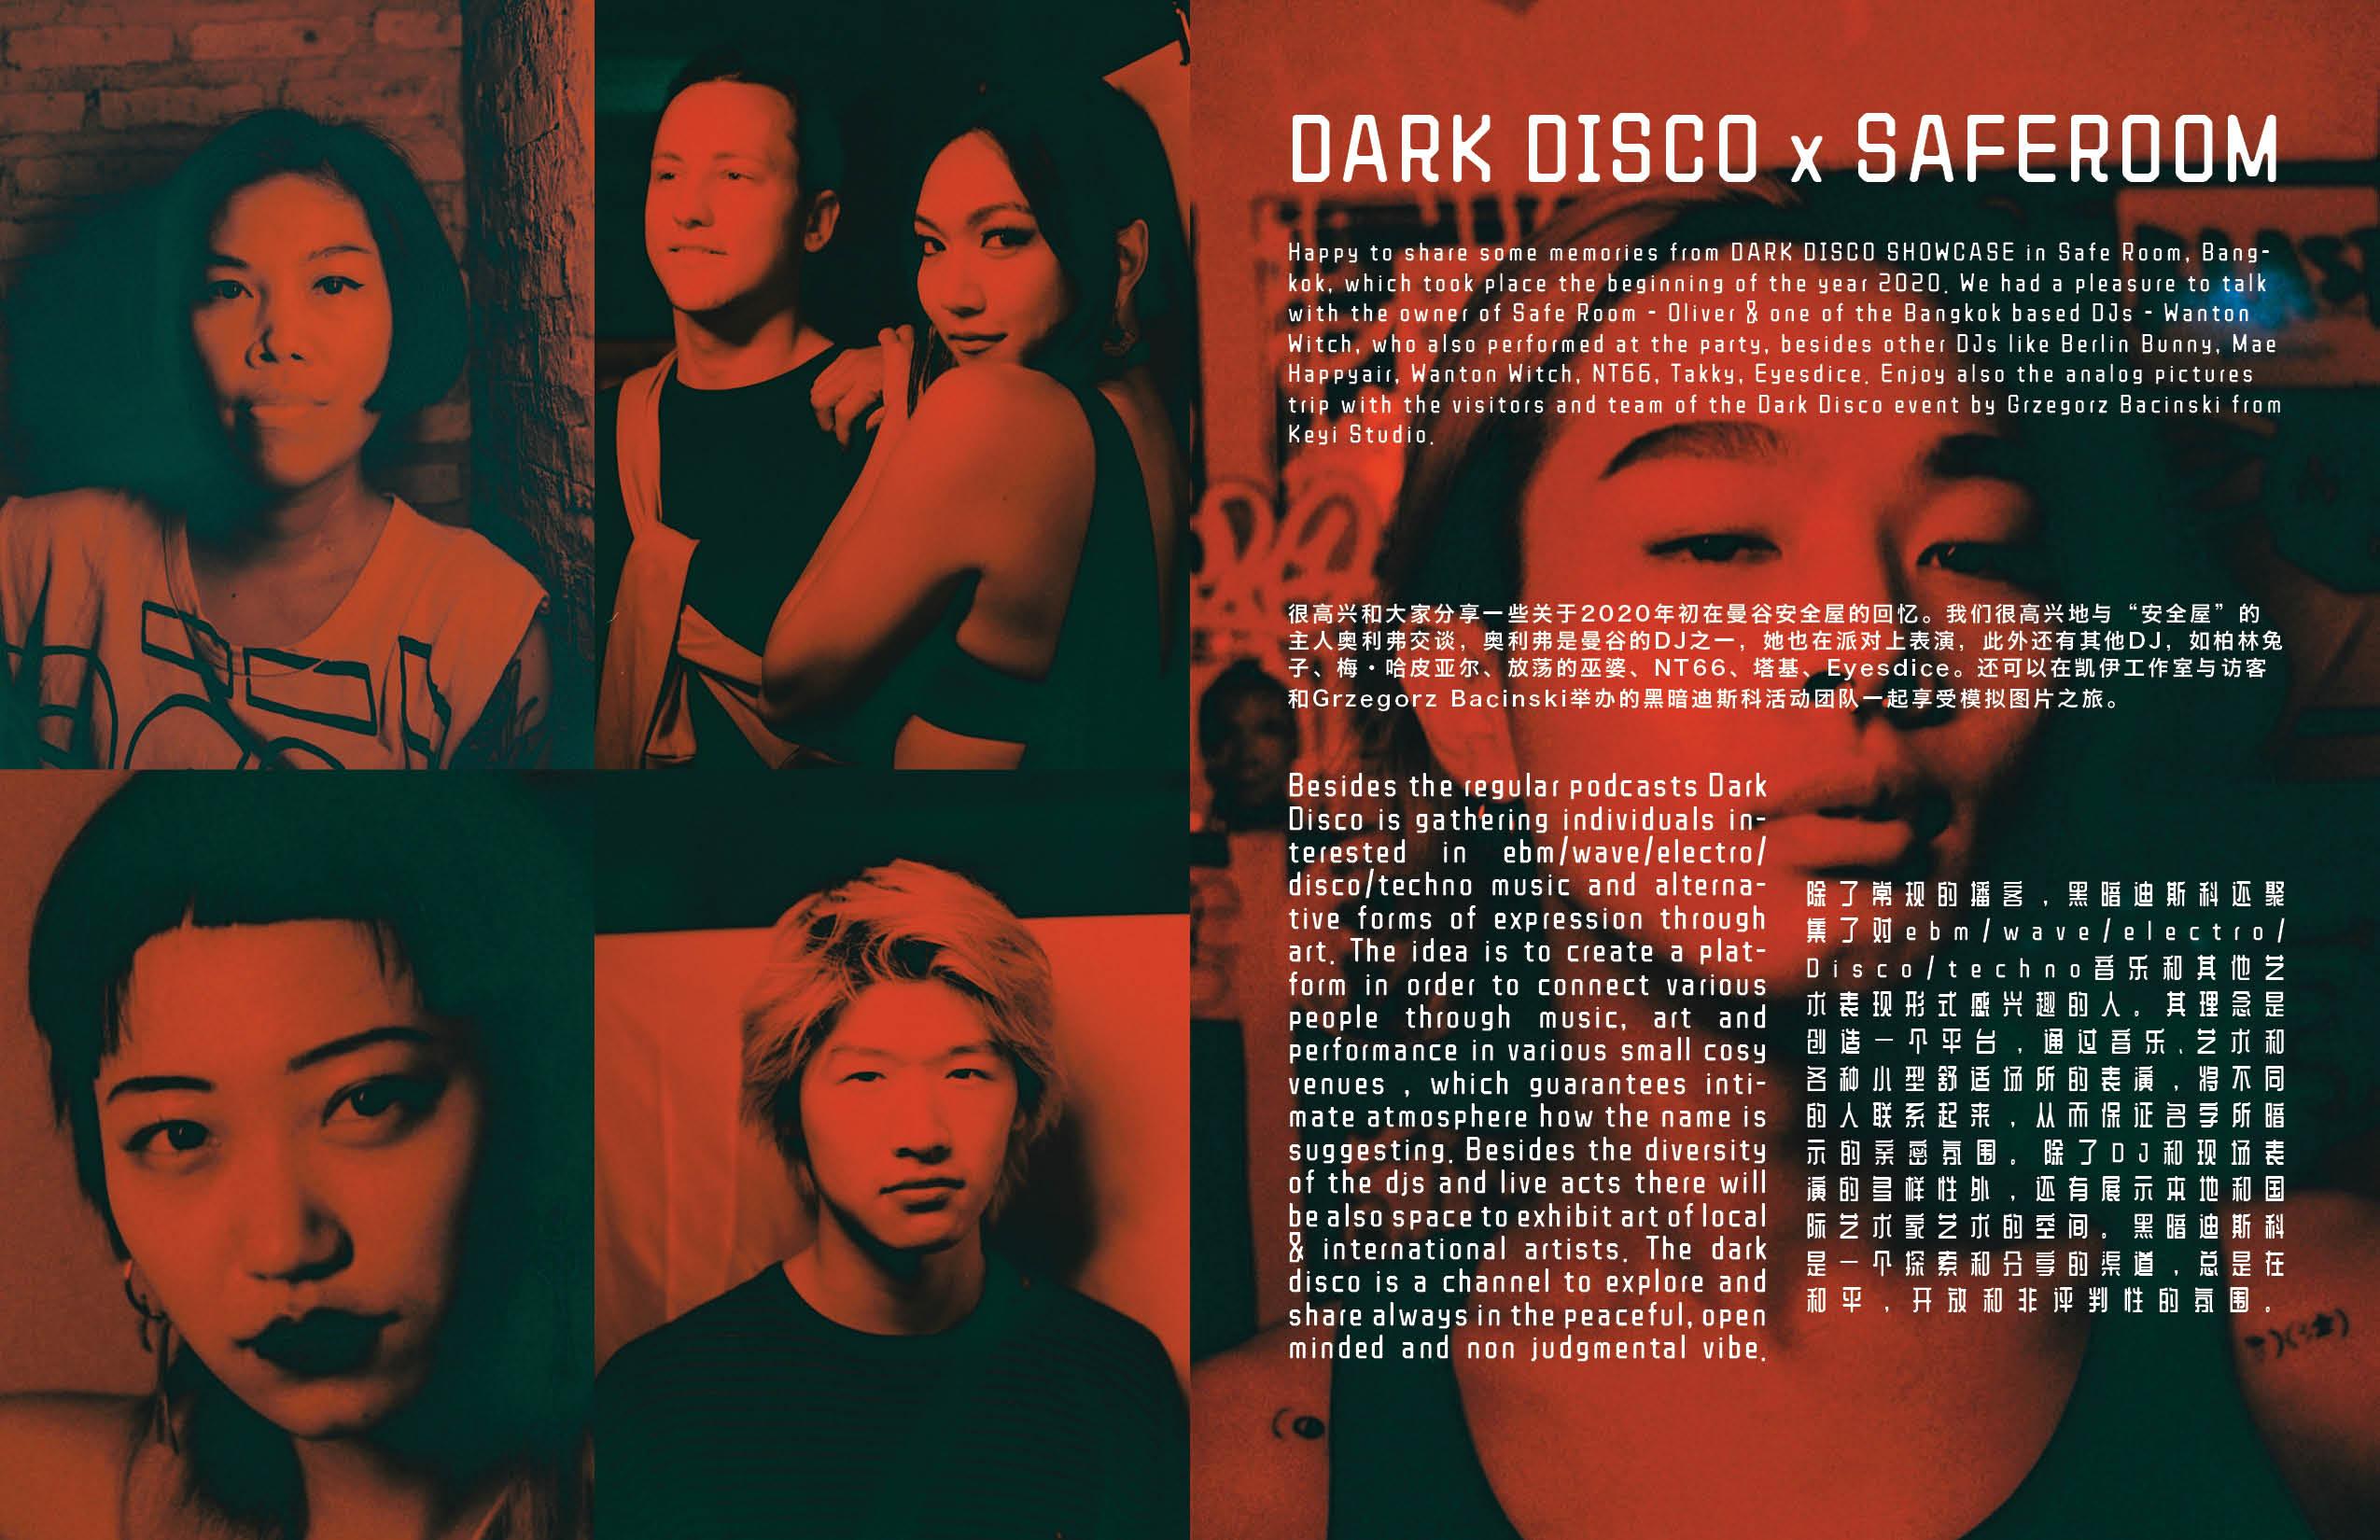 dark disco safe room Bangkok and photos by keyi studio for keyi magazine